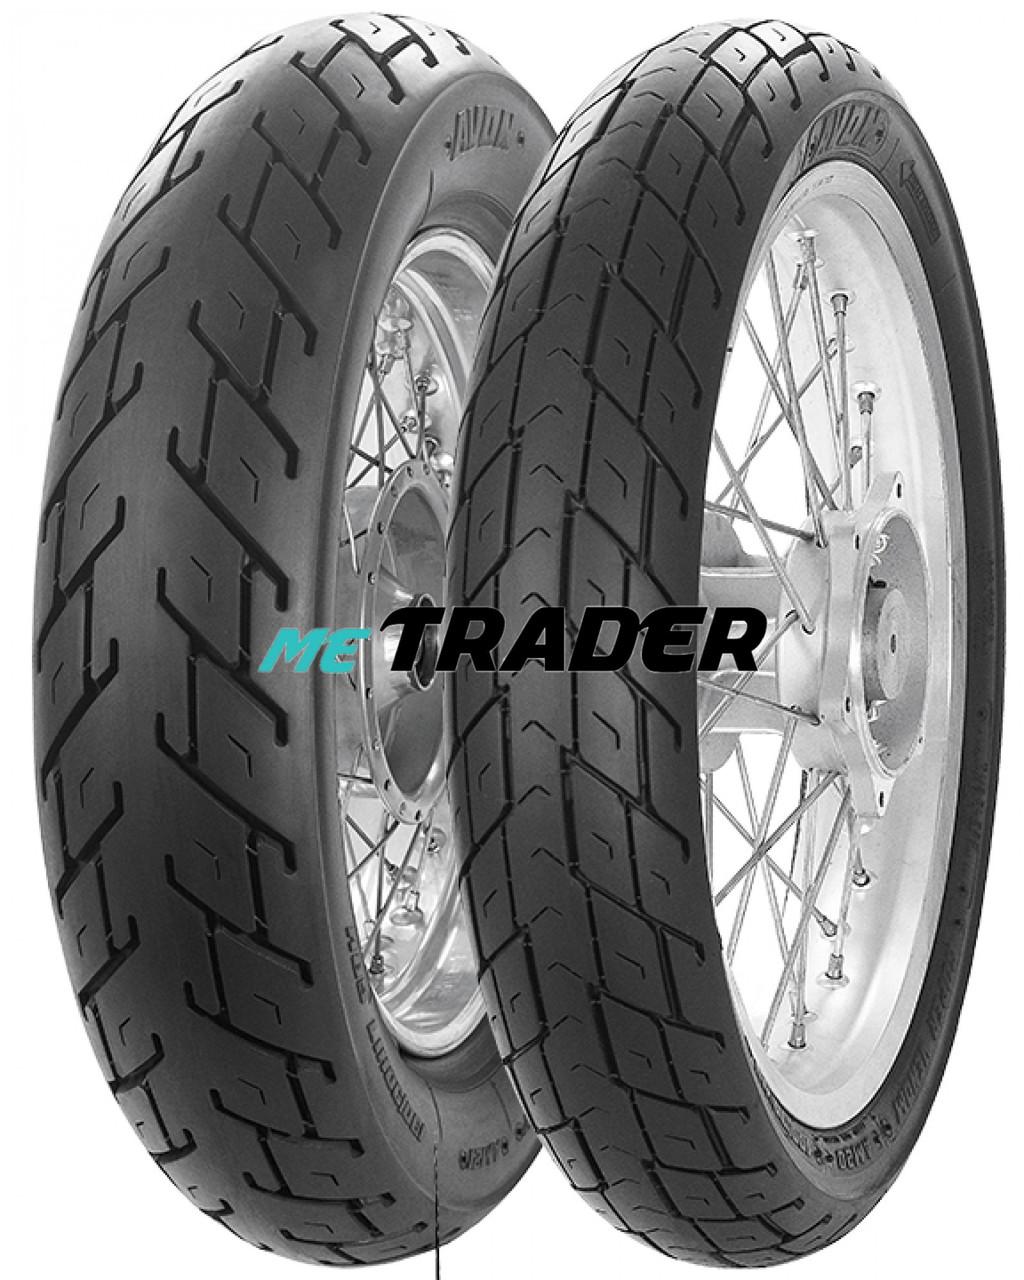 Avon Tyres AM20 RoadRunner 90/90 R19 52H TL FRONT